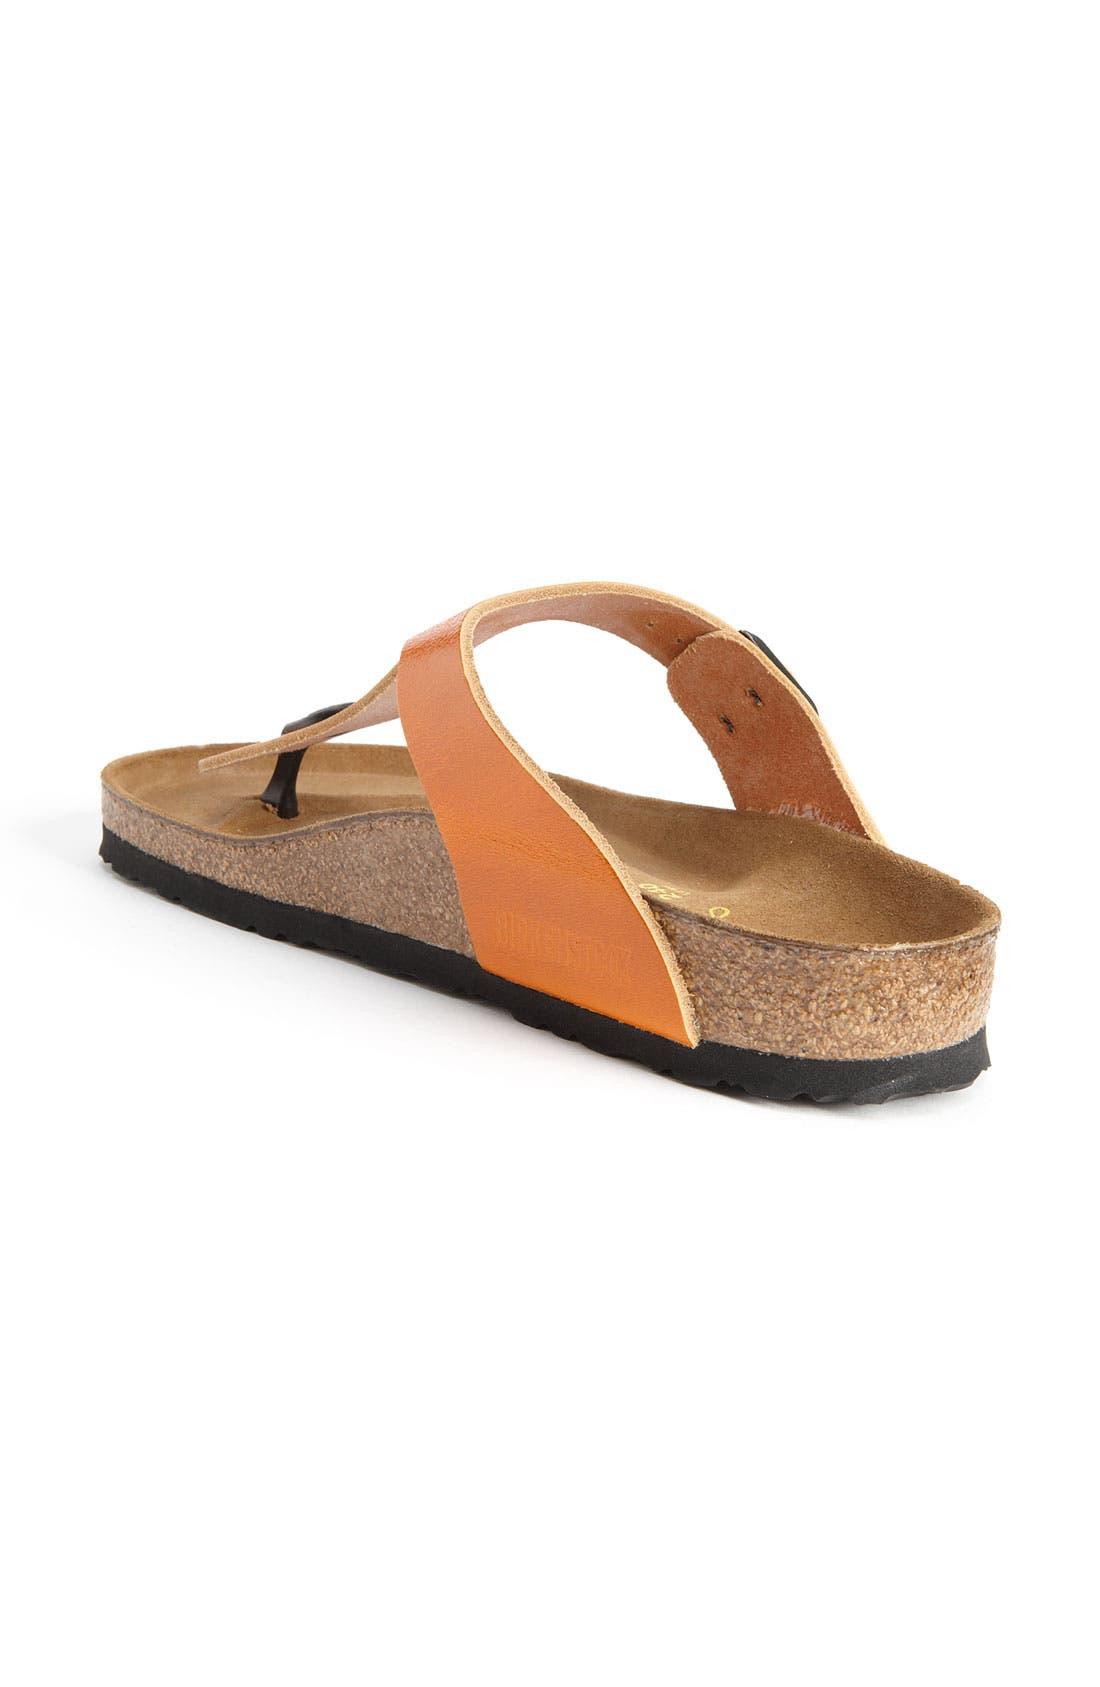 Alternate Image 2  - Birkenstock 'Gizeh' Sandal (Exclusive)